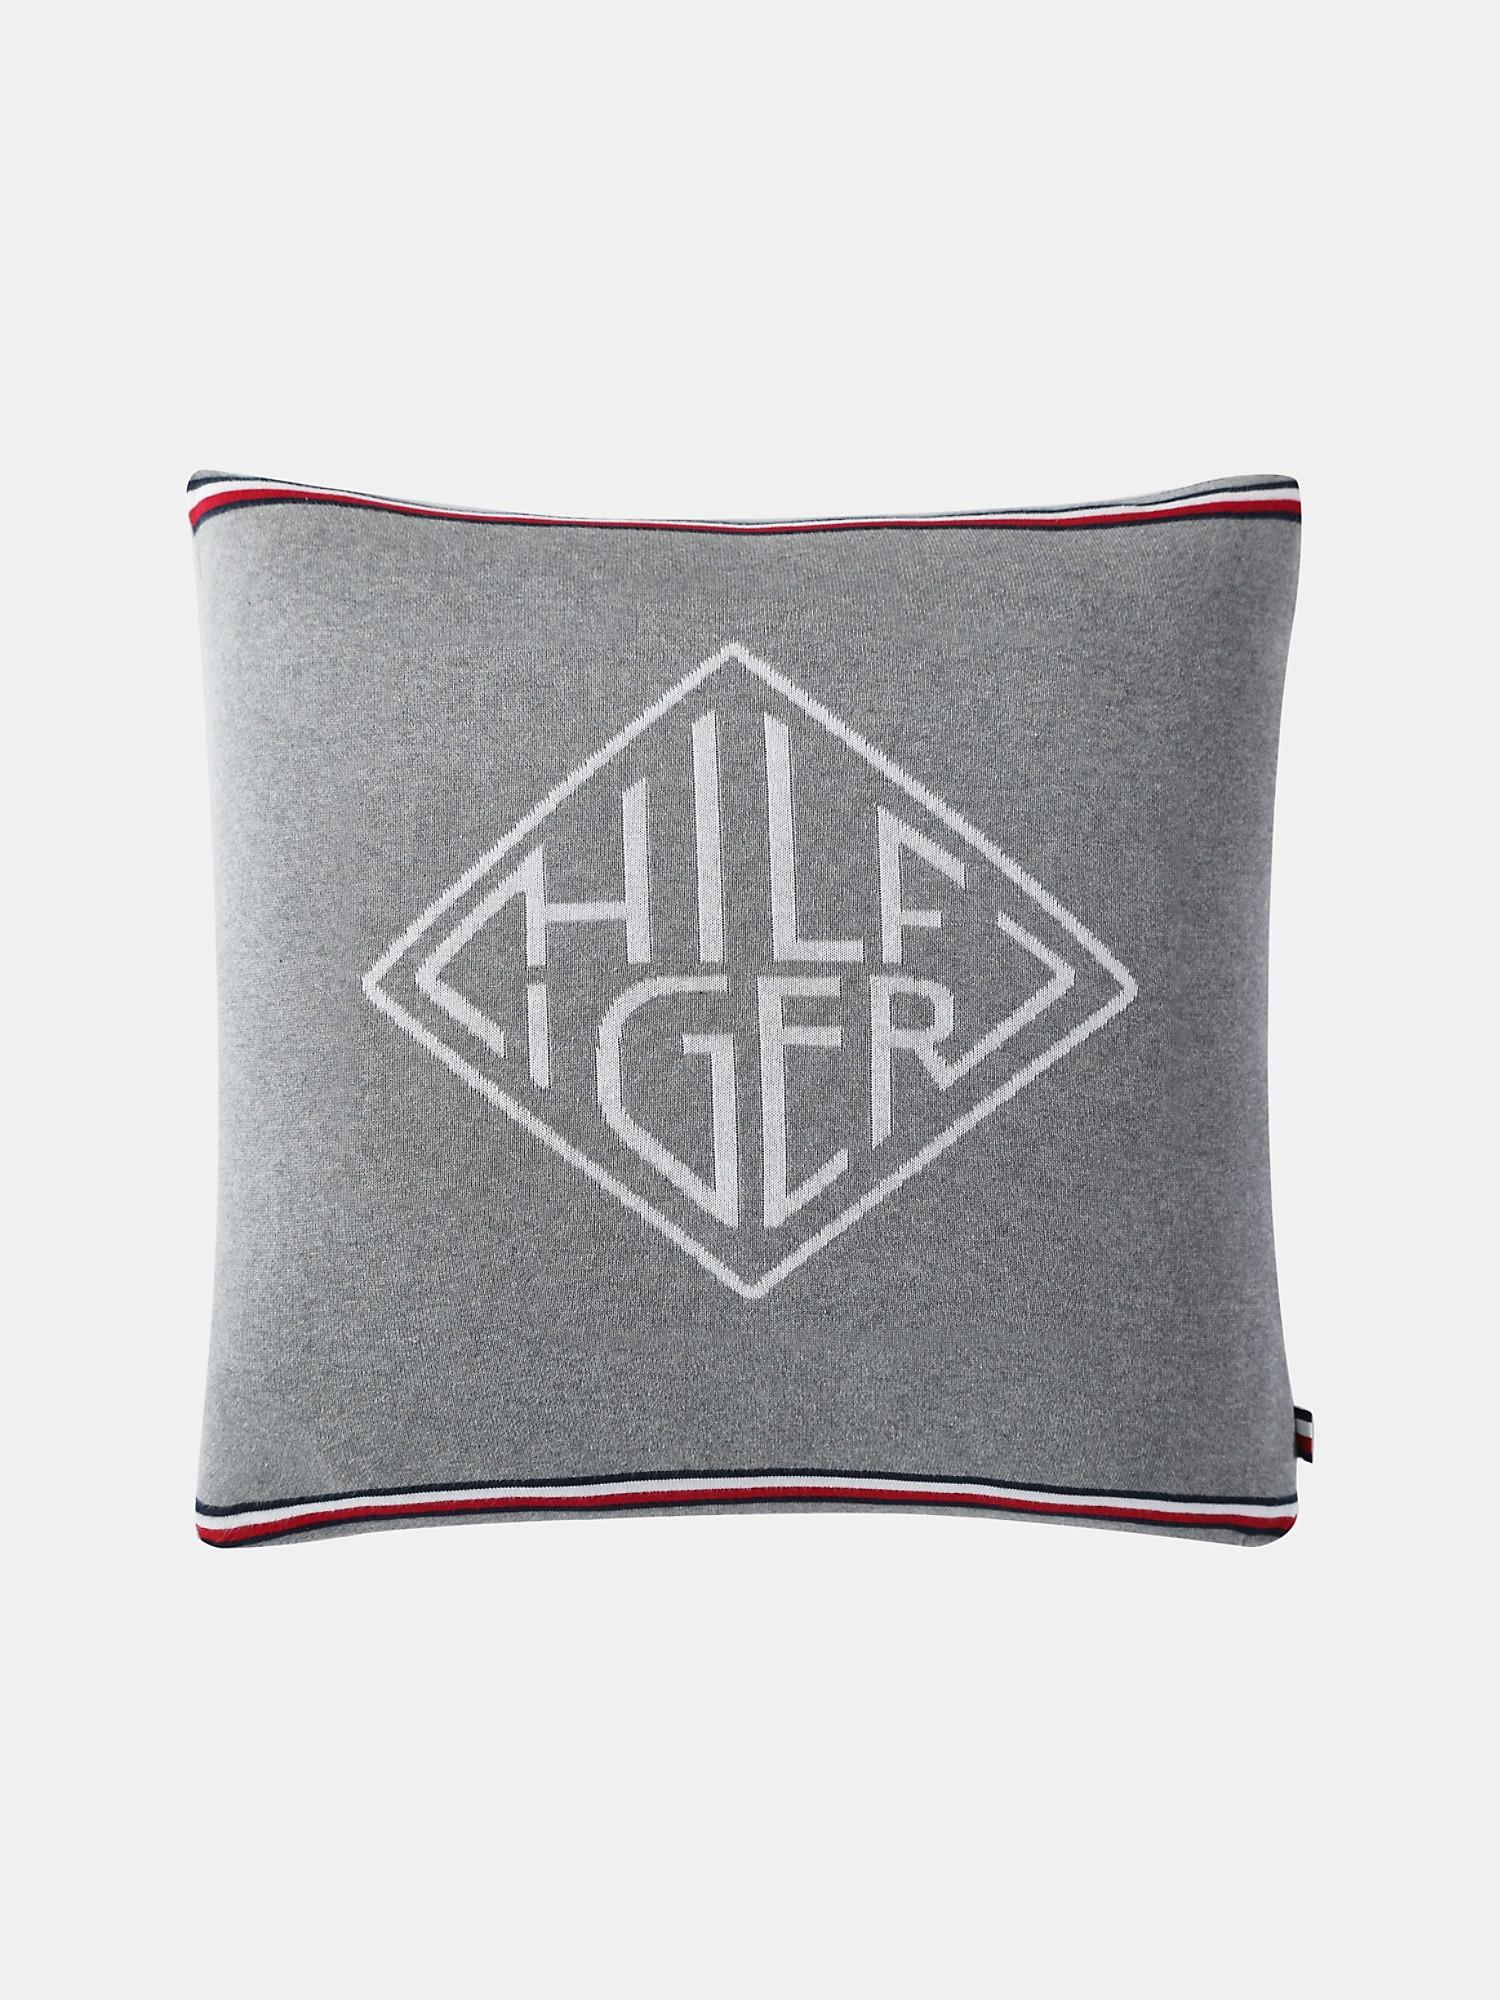 TOMMY HILFIGER Hilfiger Monogram Decorative Pillow